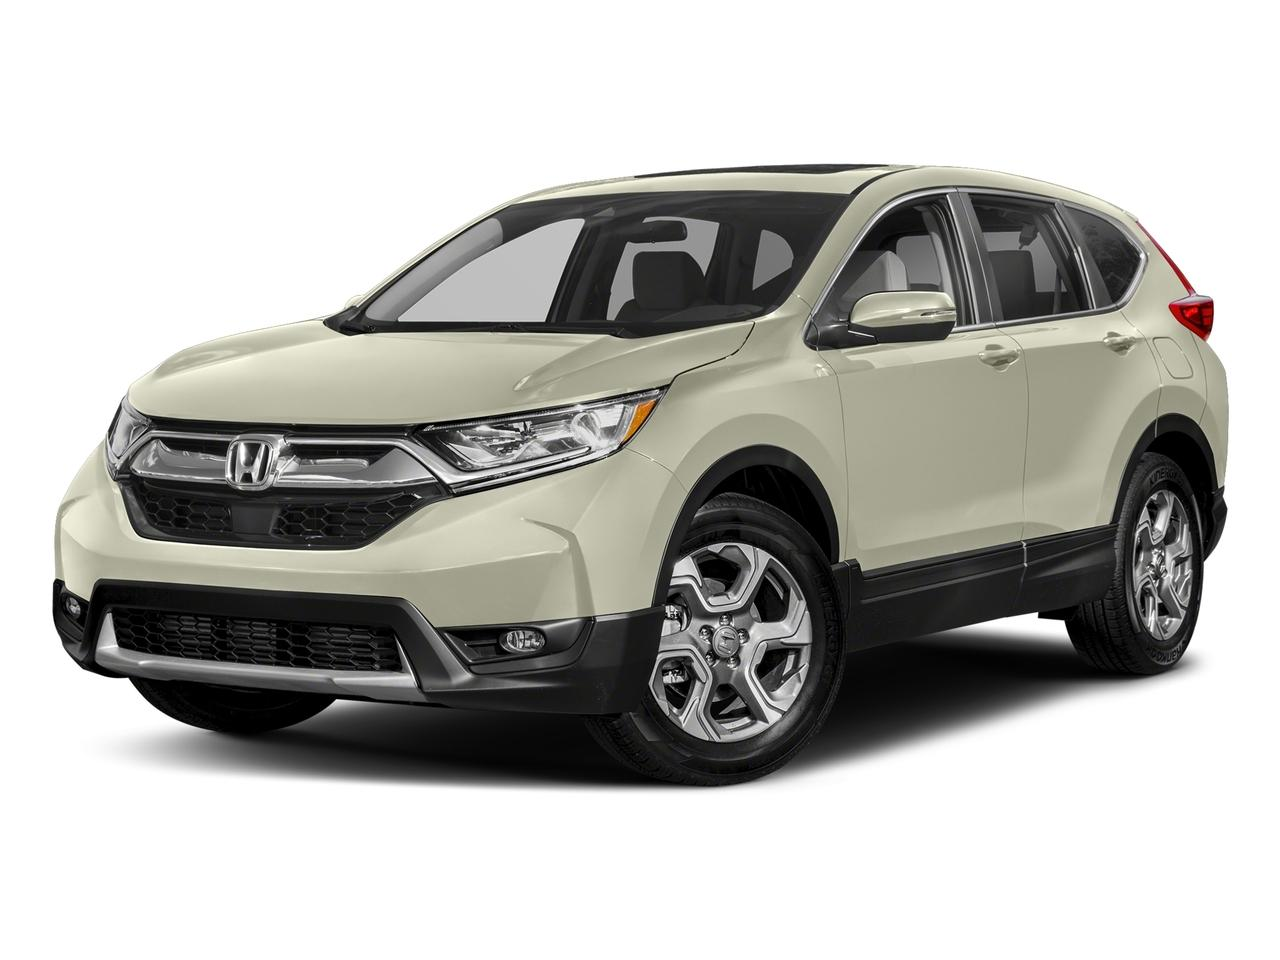 2018 Honda CR-V Vehicle Photo in San Antonio, TX 78238